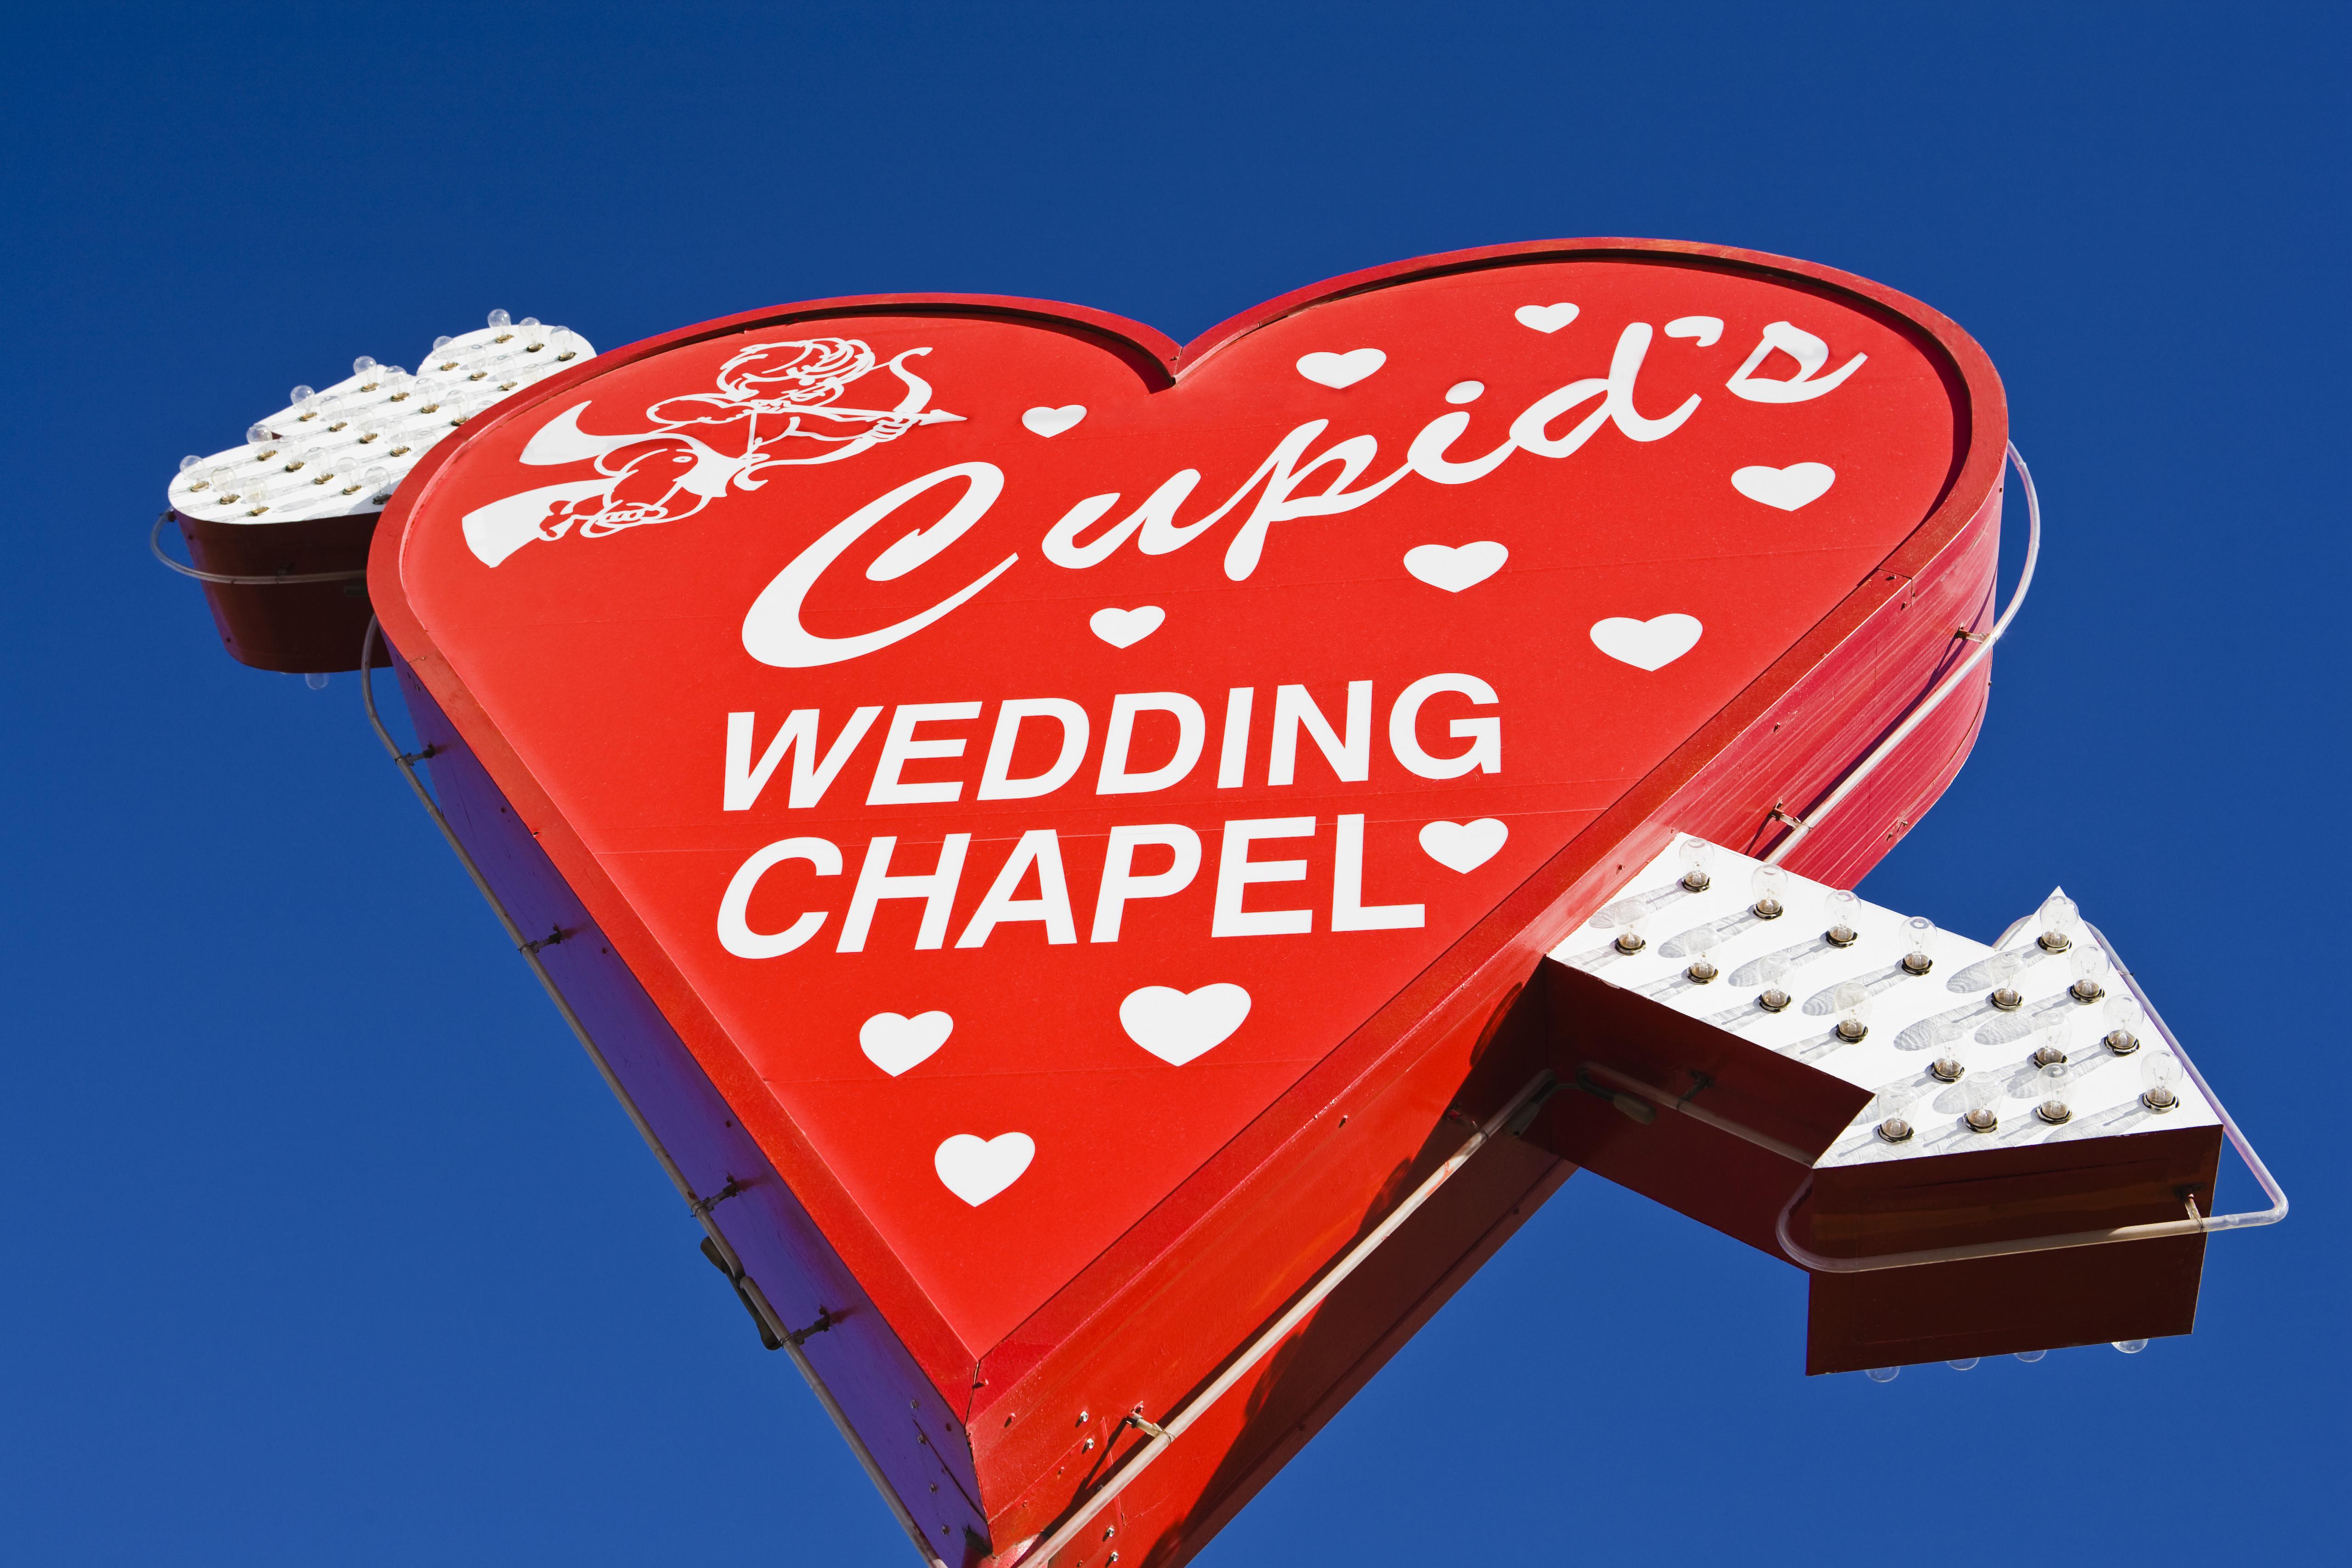 cupids wedding chapel in las vegas vegas wedding chapels nevada las vegas cupid s wedding chapel valentine s day